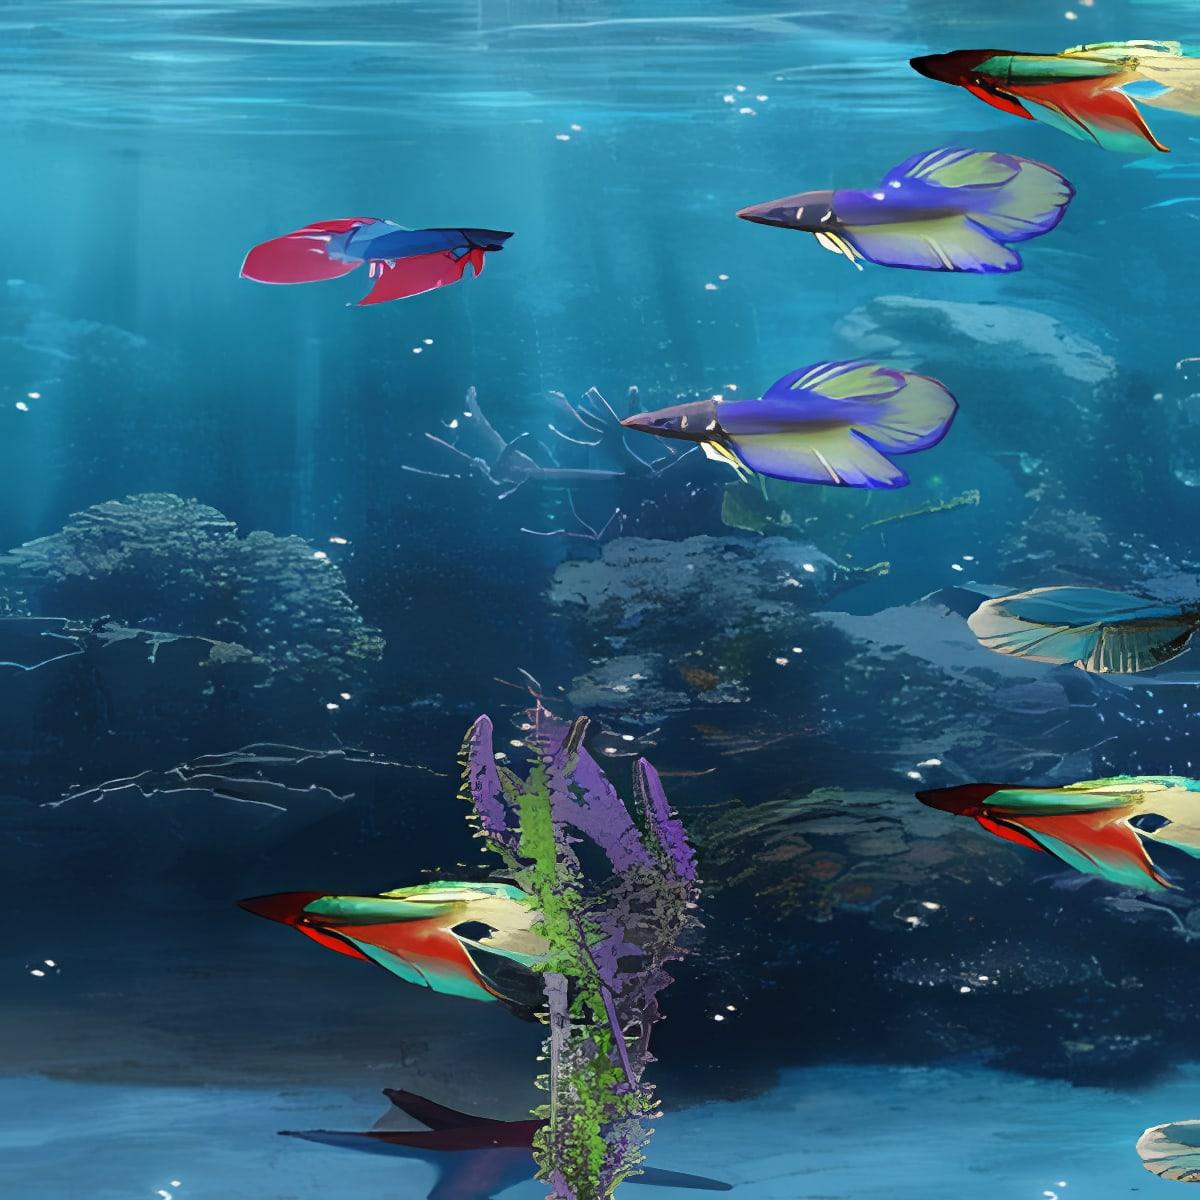 Beta Fish in 3D Live Wallpaper